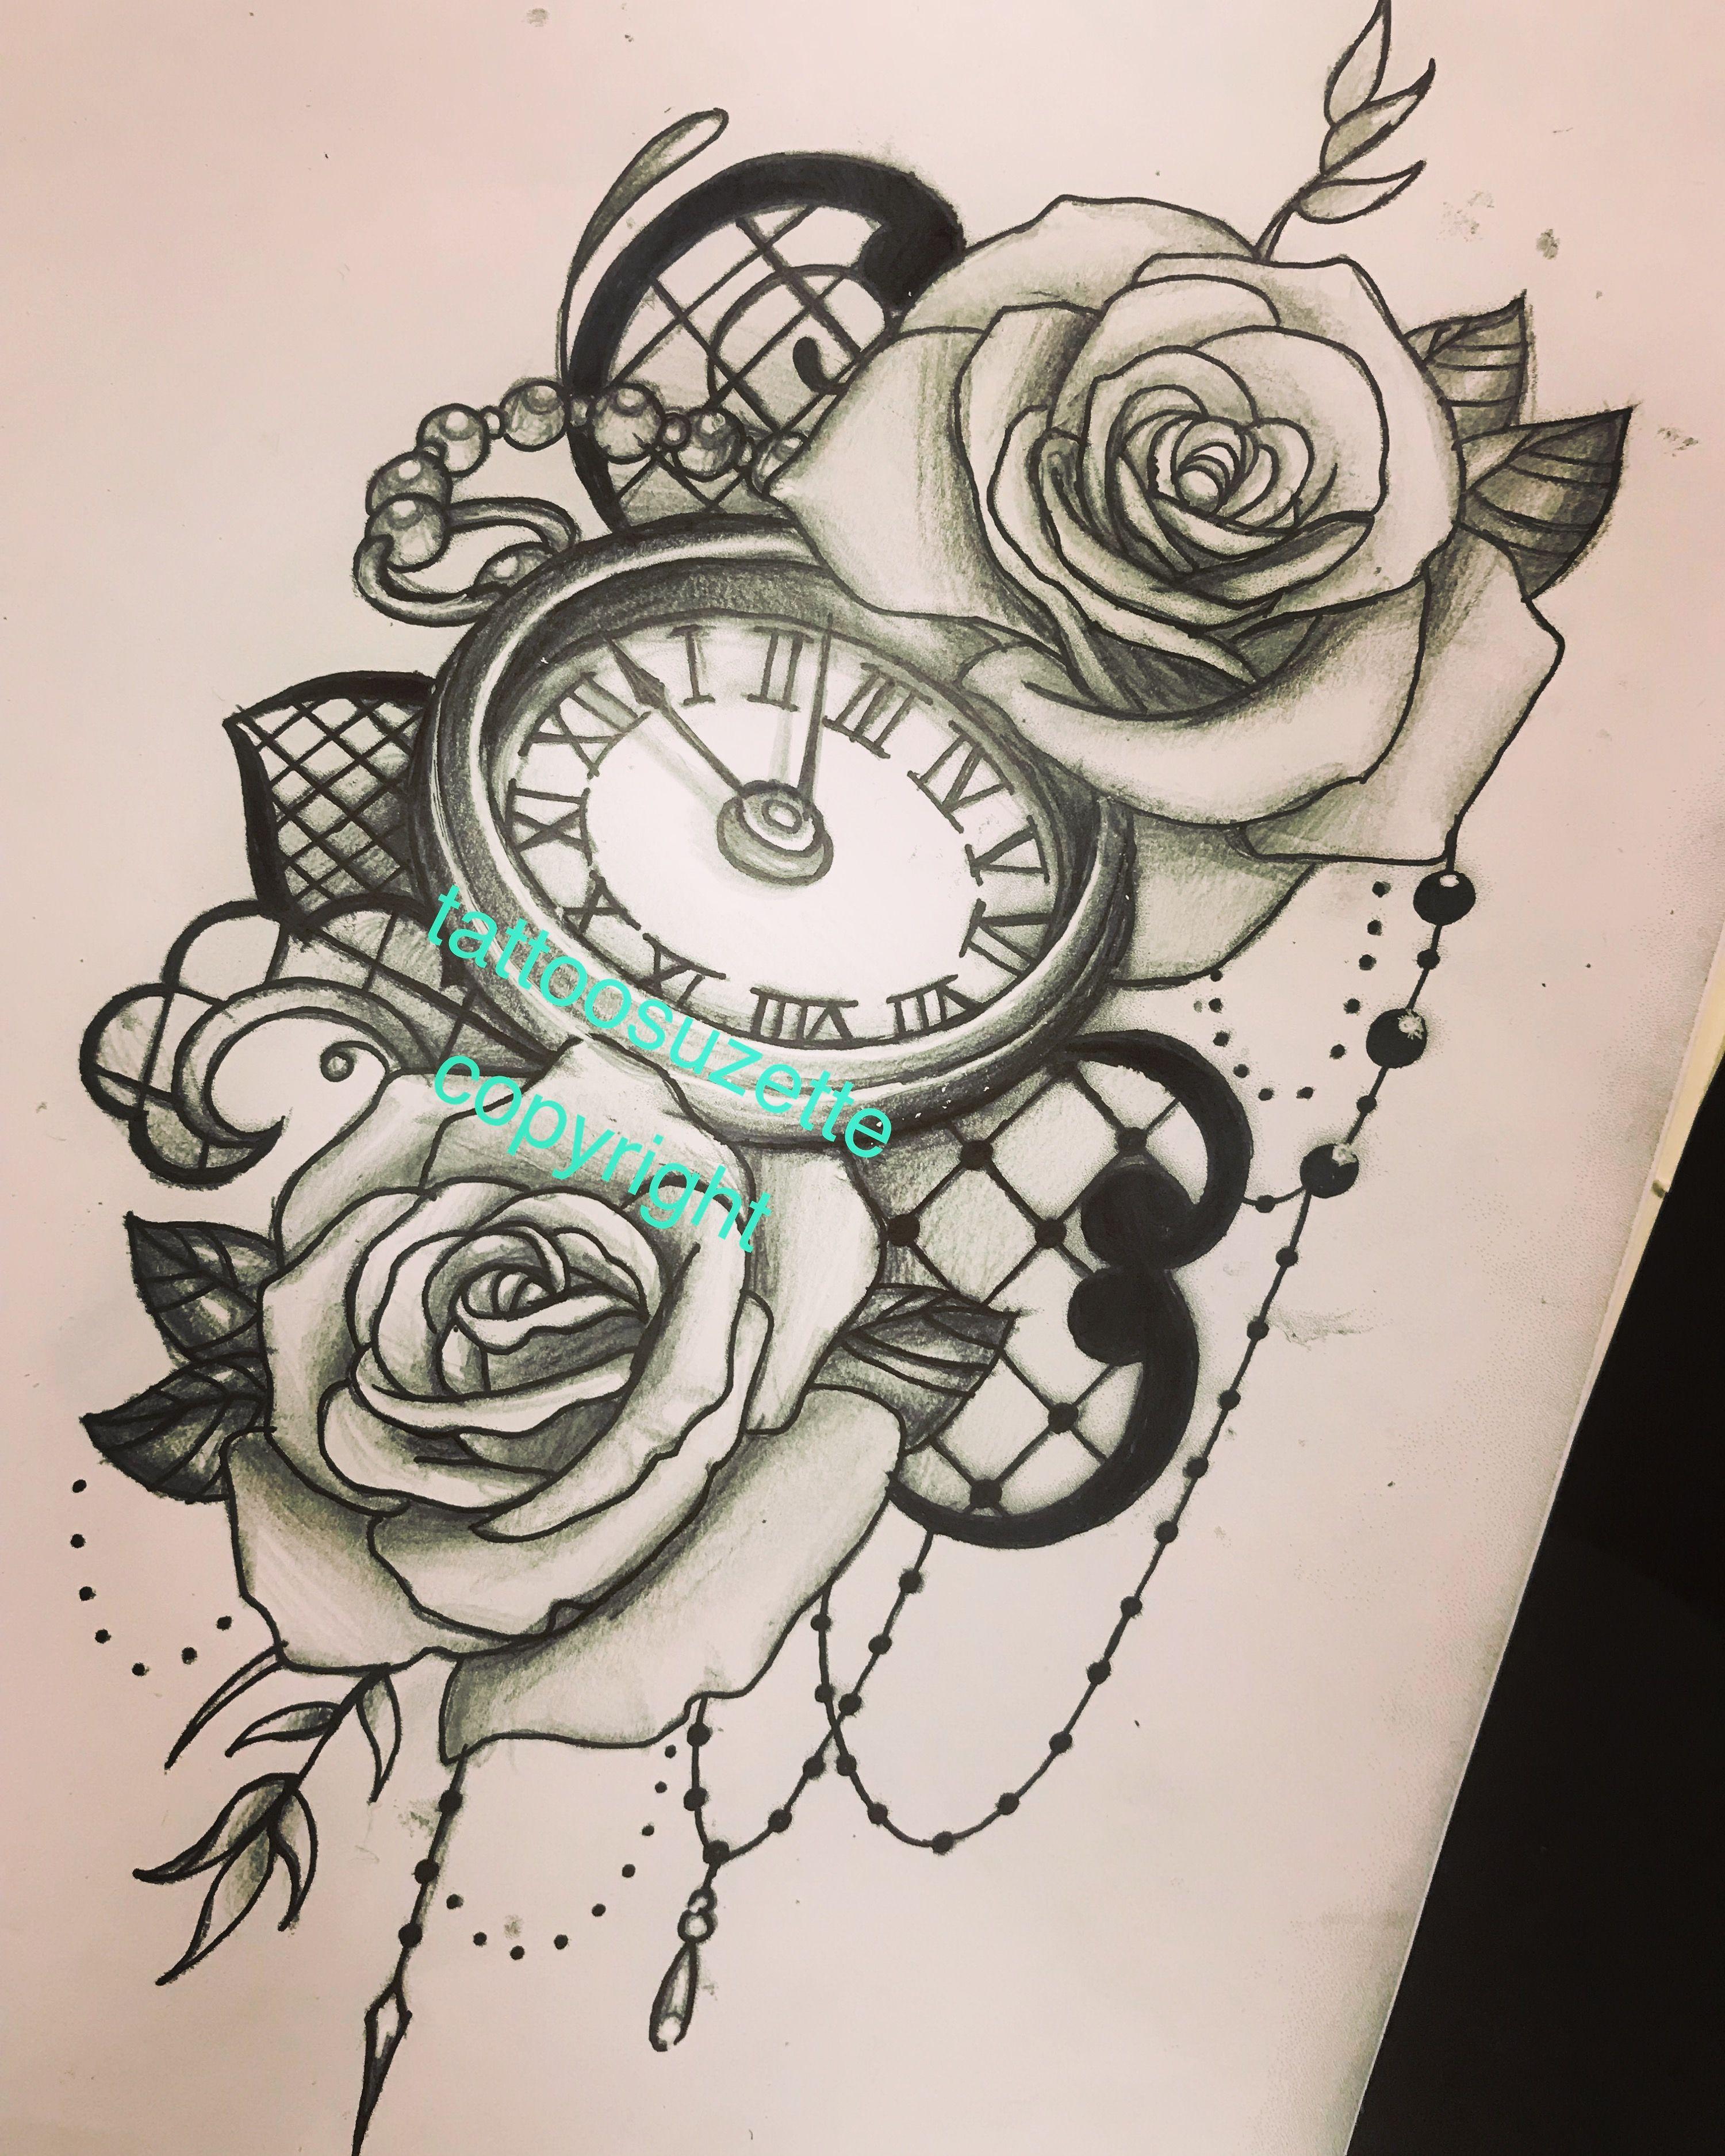 Lace Roses Clock Tattoo Design Clock Tattoo Design Dream Catcher Tattoo Design Clock Tattoo